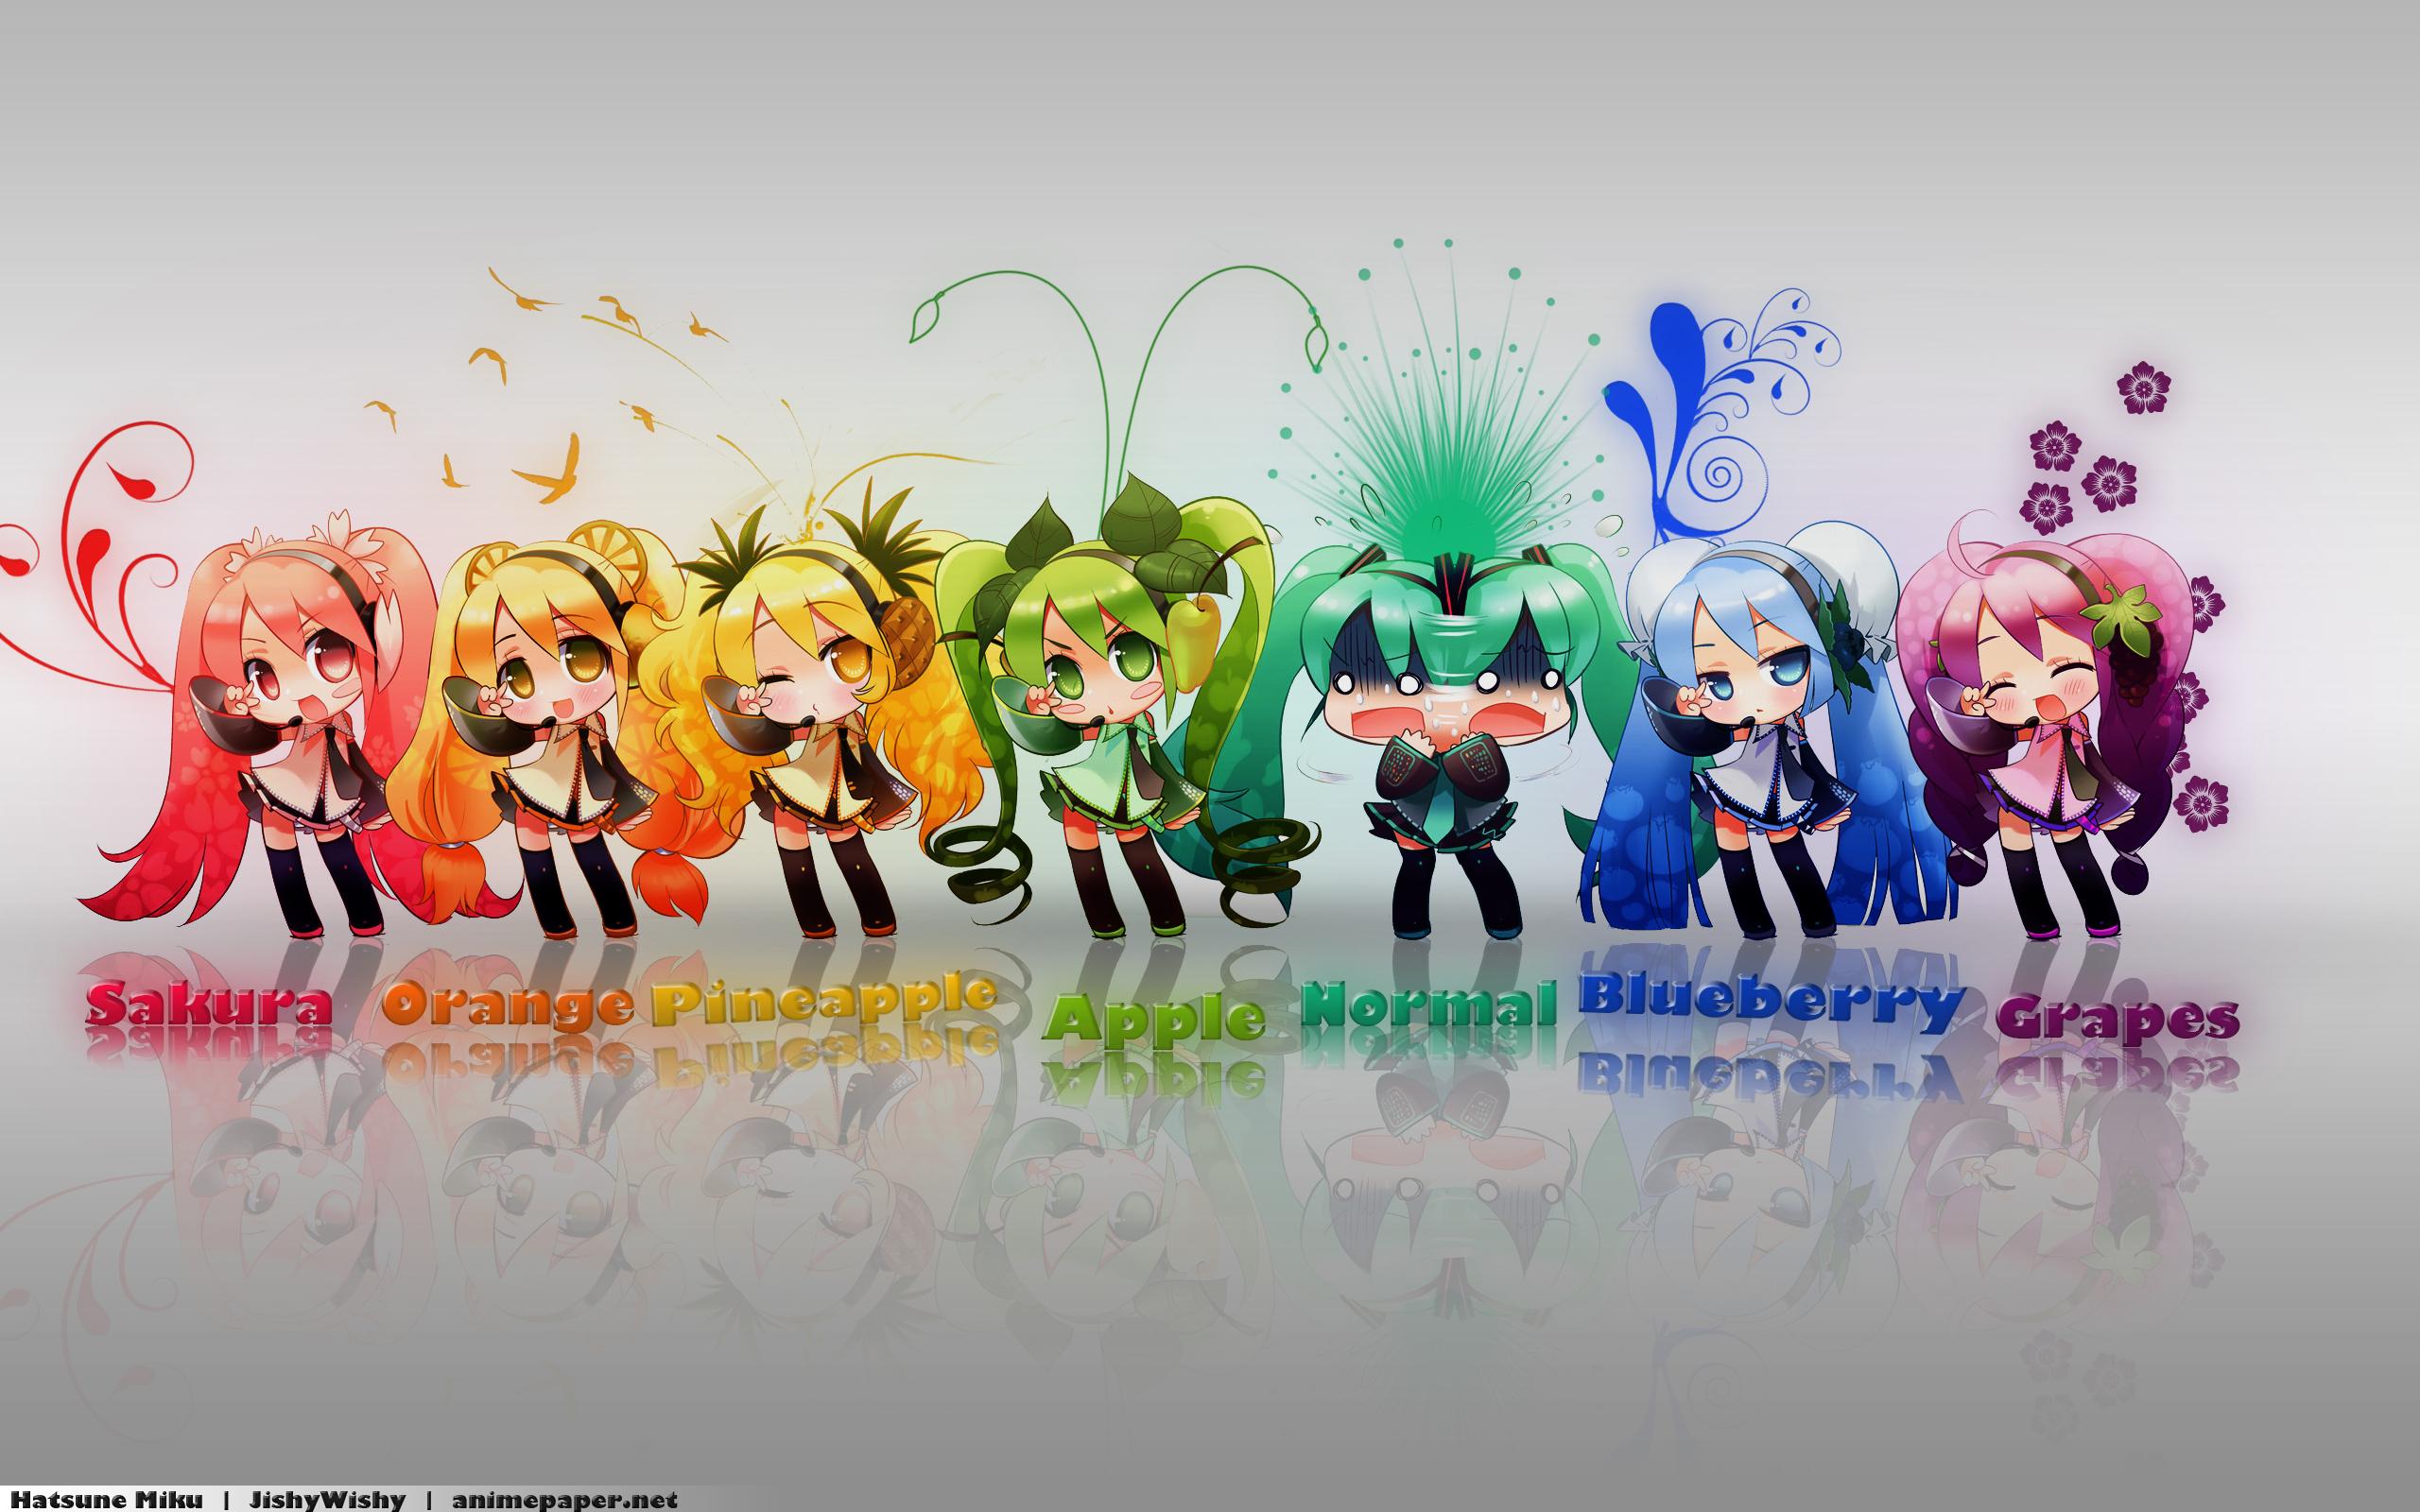 Colors of Miku